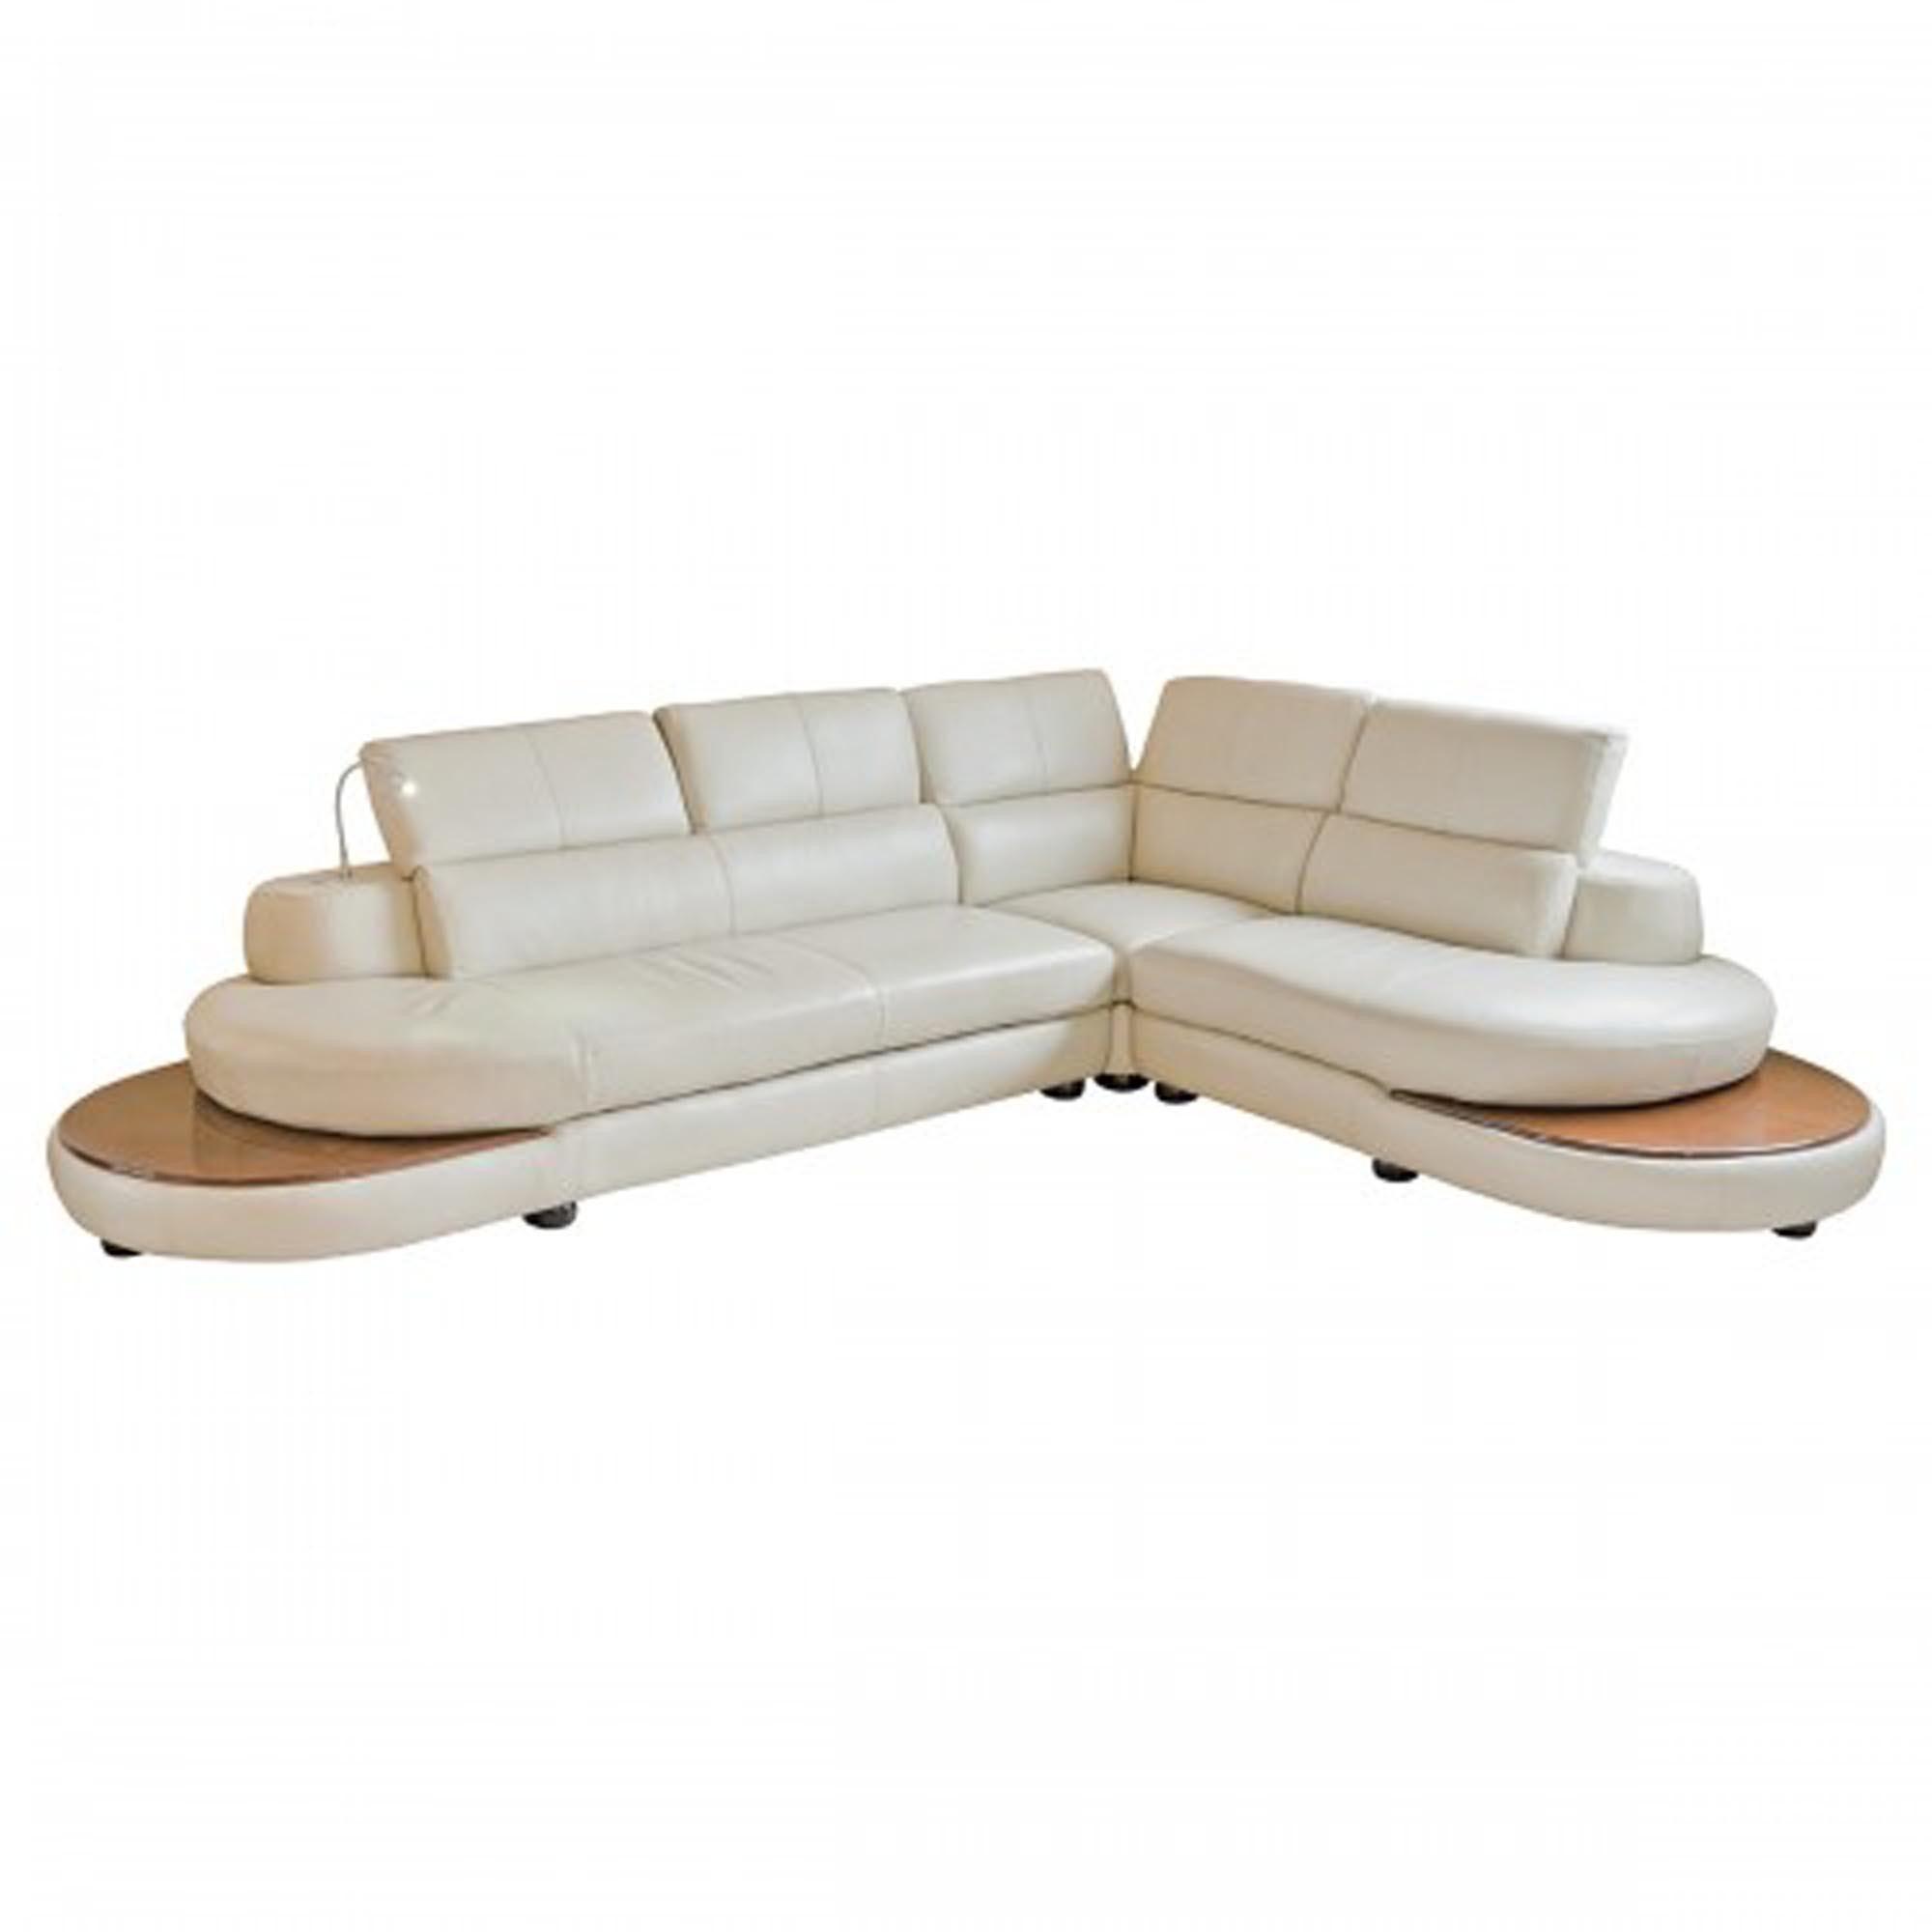 Cream Leather Corner Sofa with LED Light